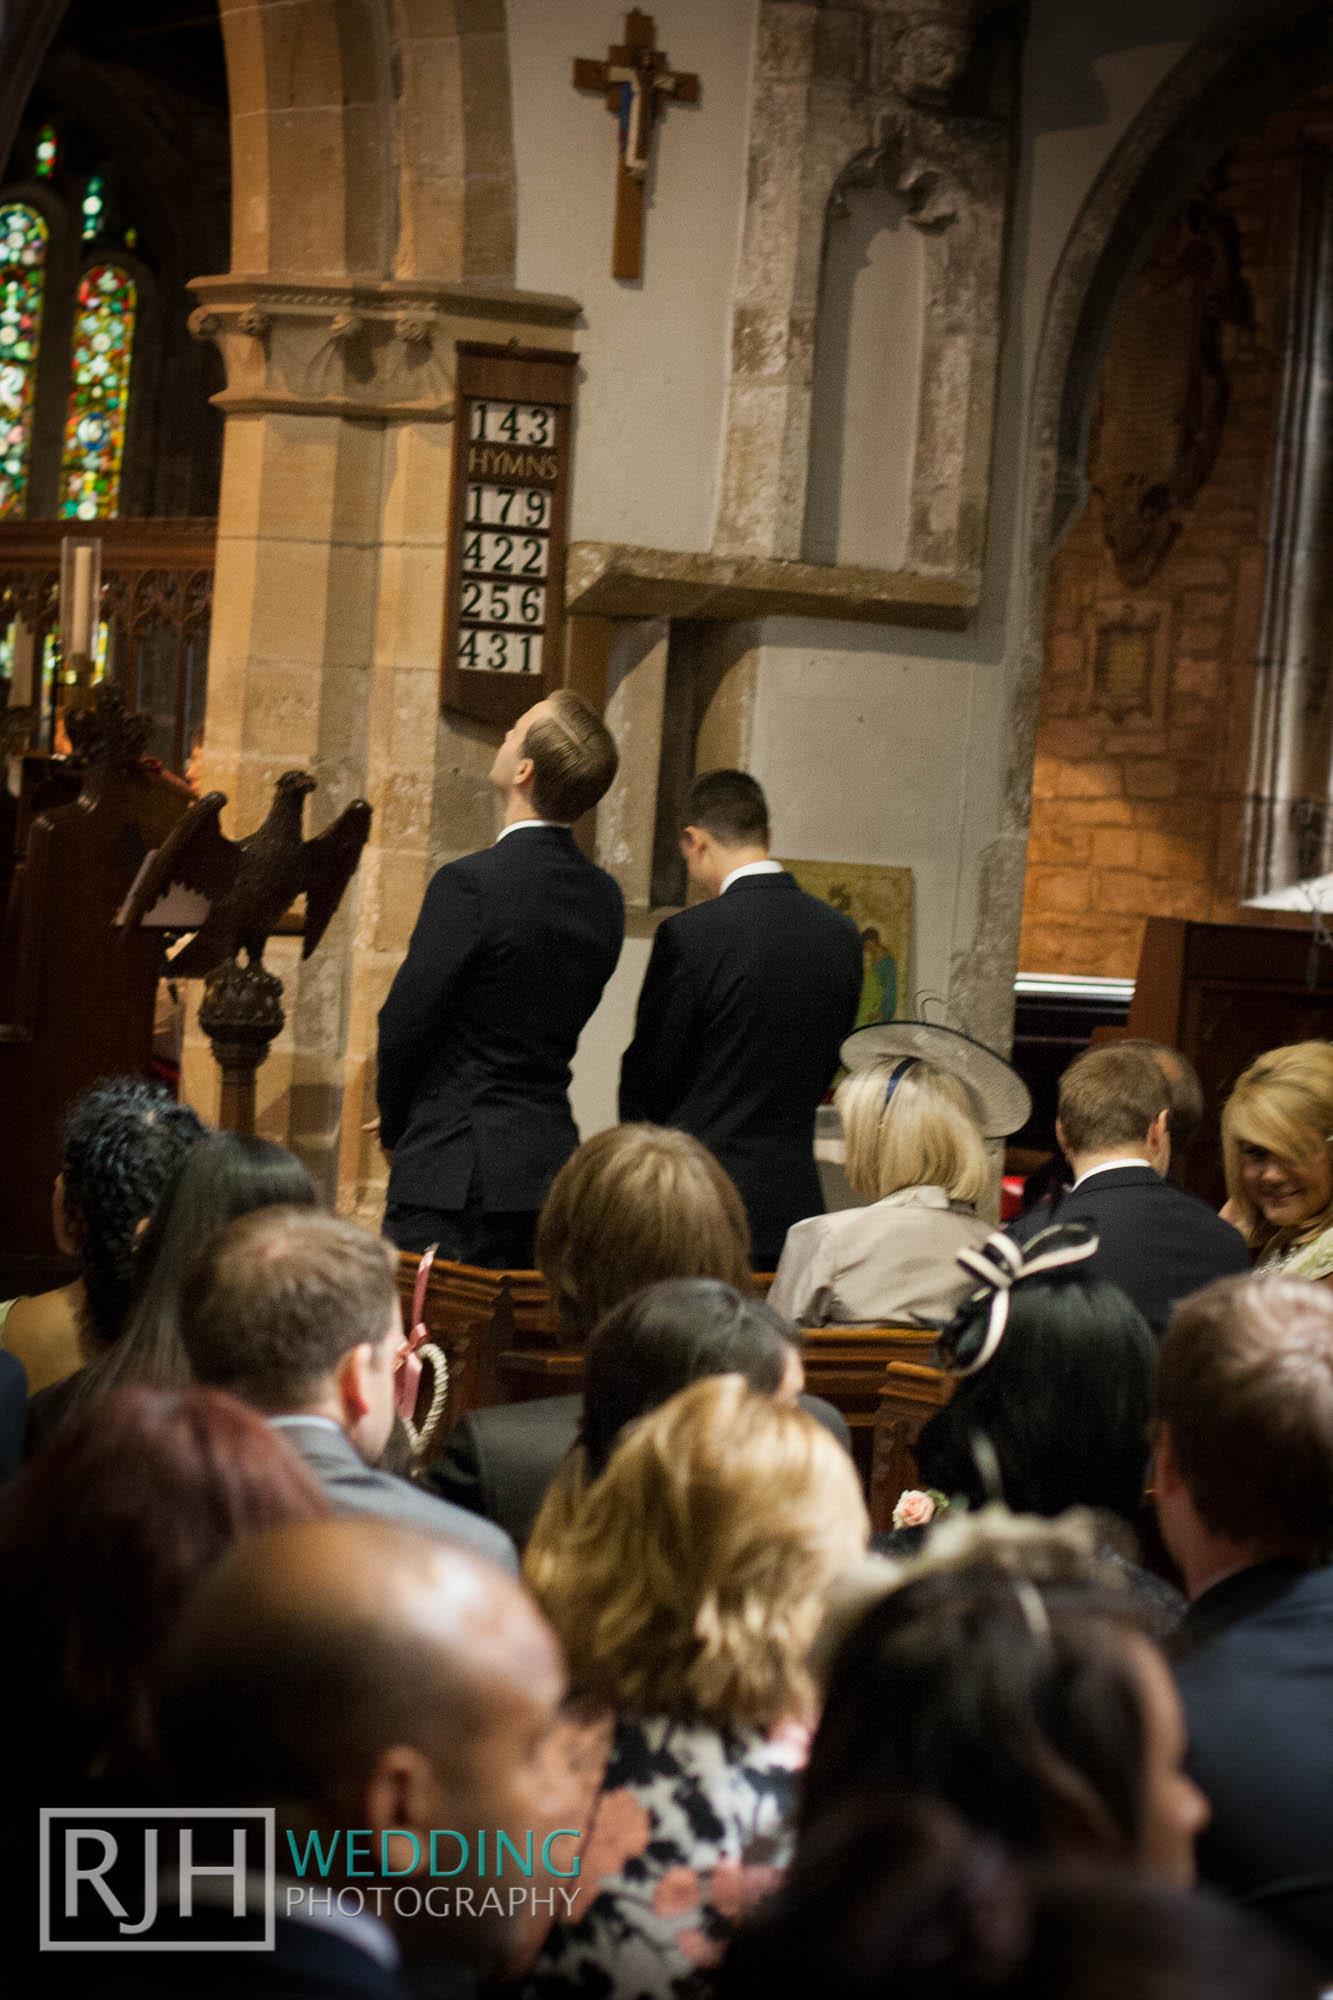 RJH Wedding Photography_Tankersley Manor Wedding_18.jpg